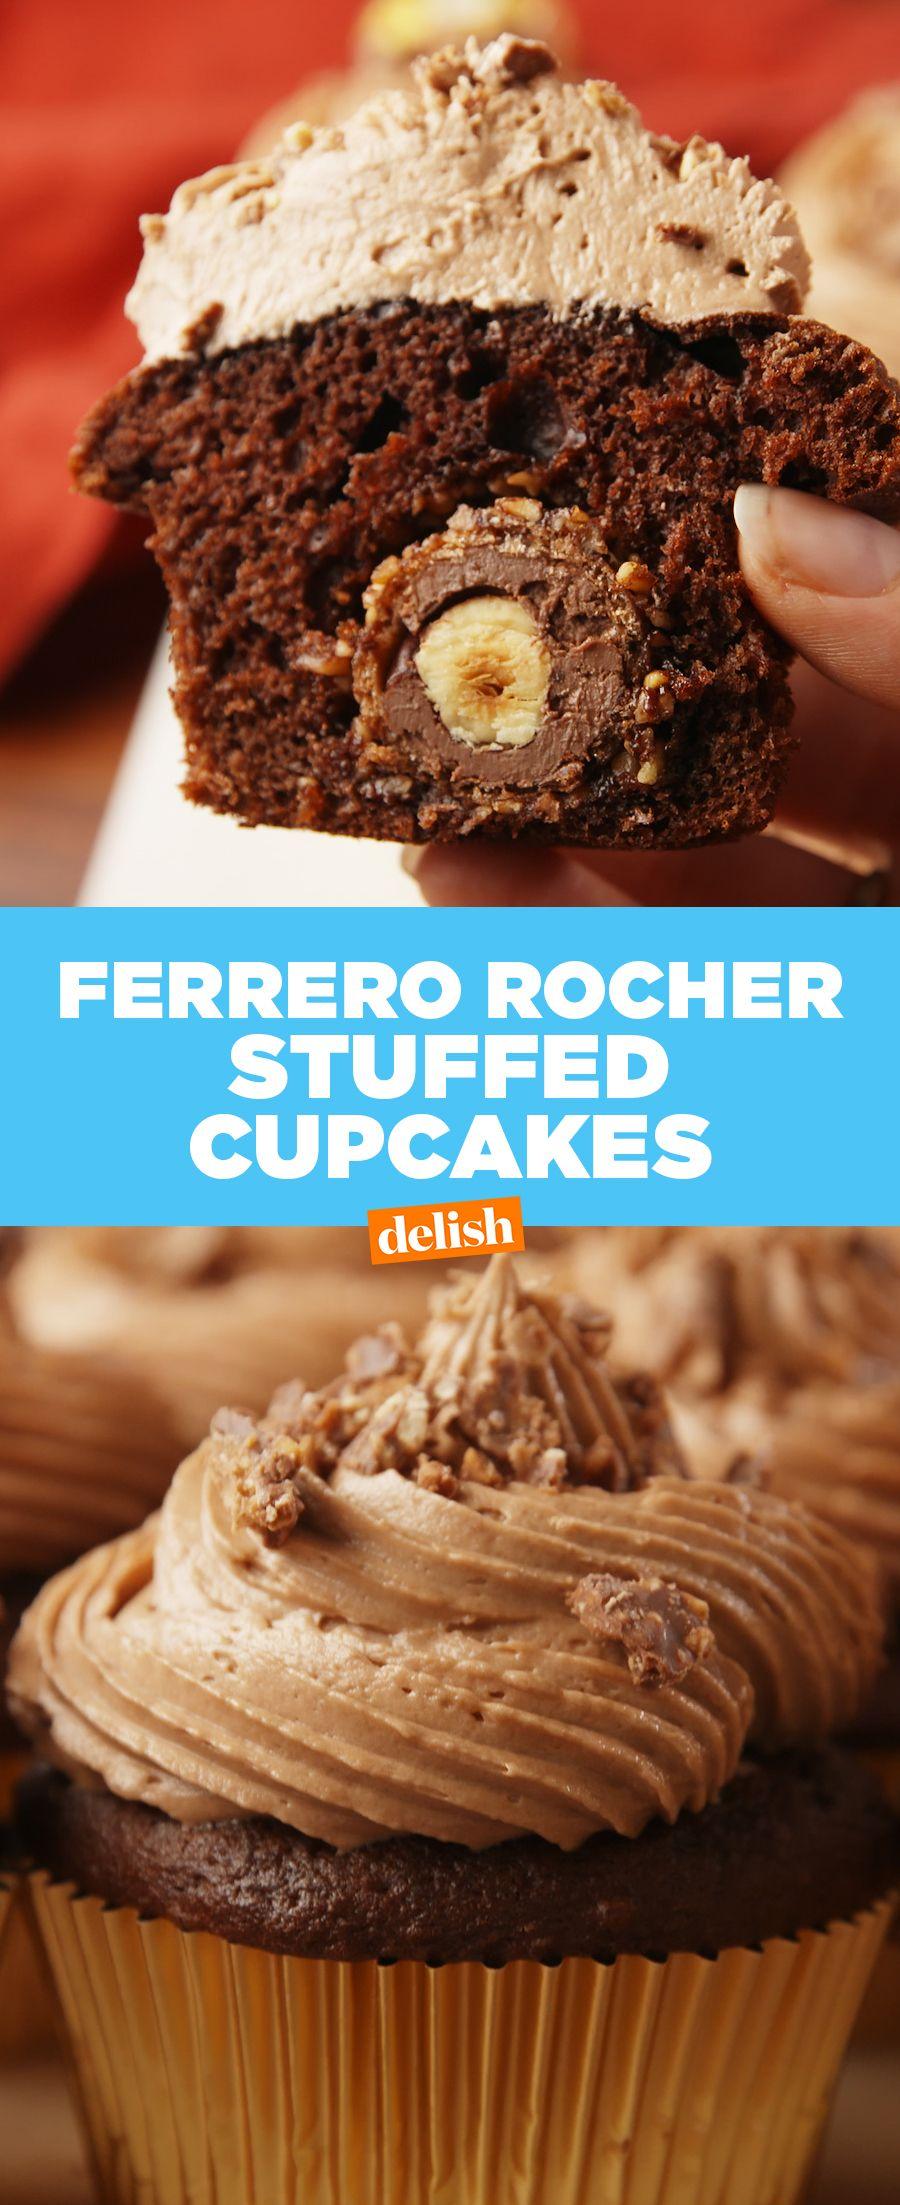 Yummy Ferrero Rocher Stuffed Cupcakes